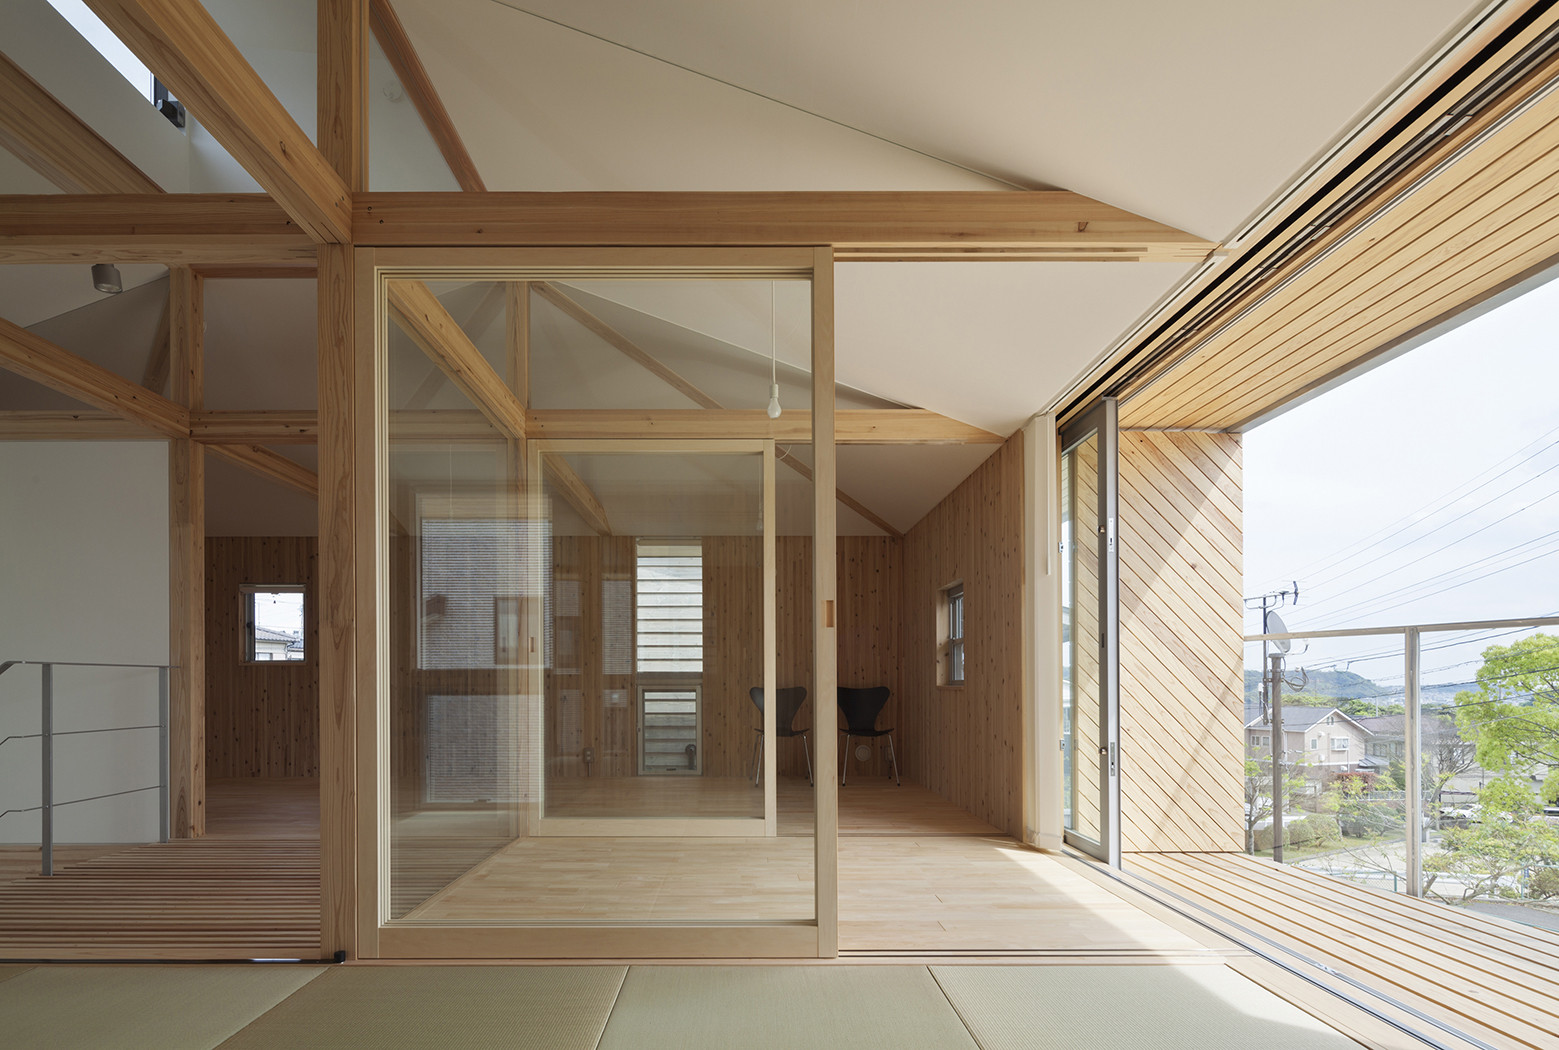 Hybrid Wooden House / Architecture Studio Nolla, © Yosuke Harigane